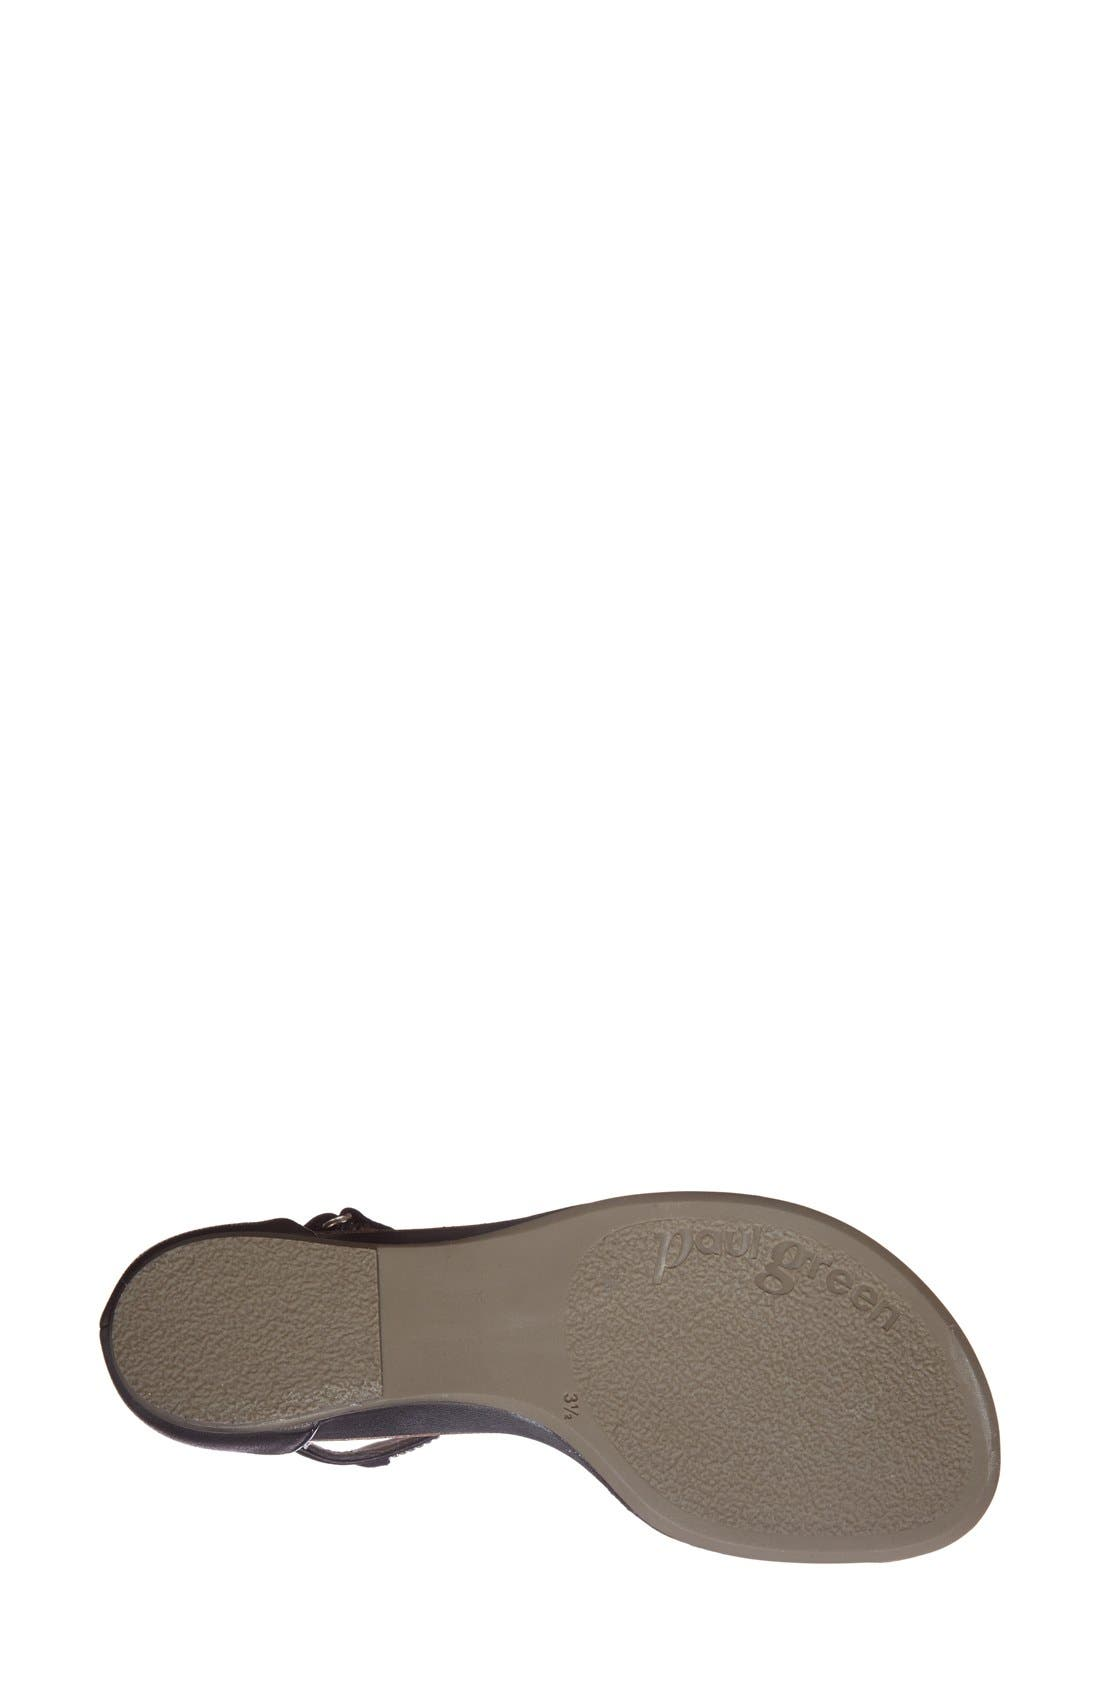 Alternate Image 4  - Paul Green 'Cotie' Ankle Strap Flat Sandal (Women)